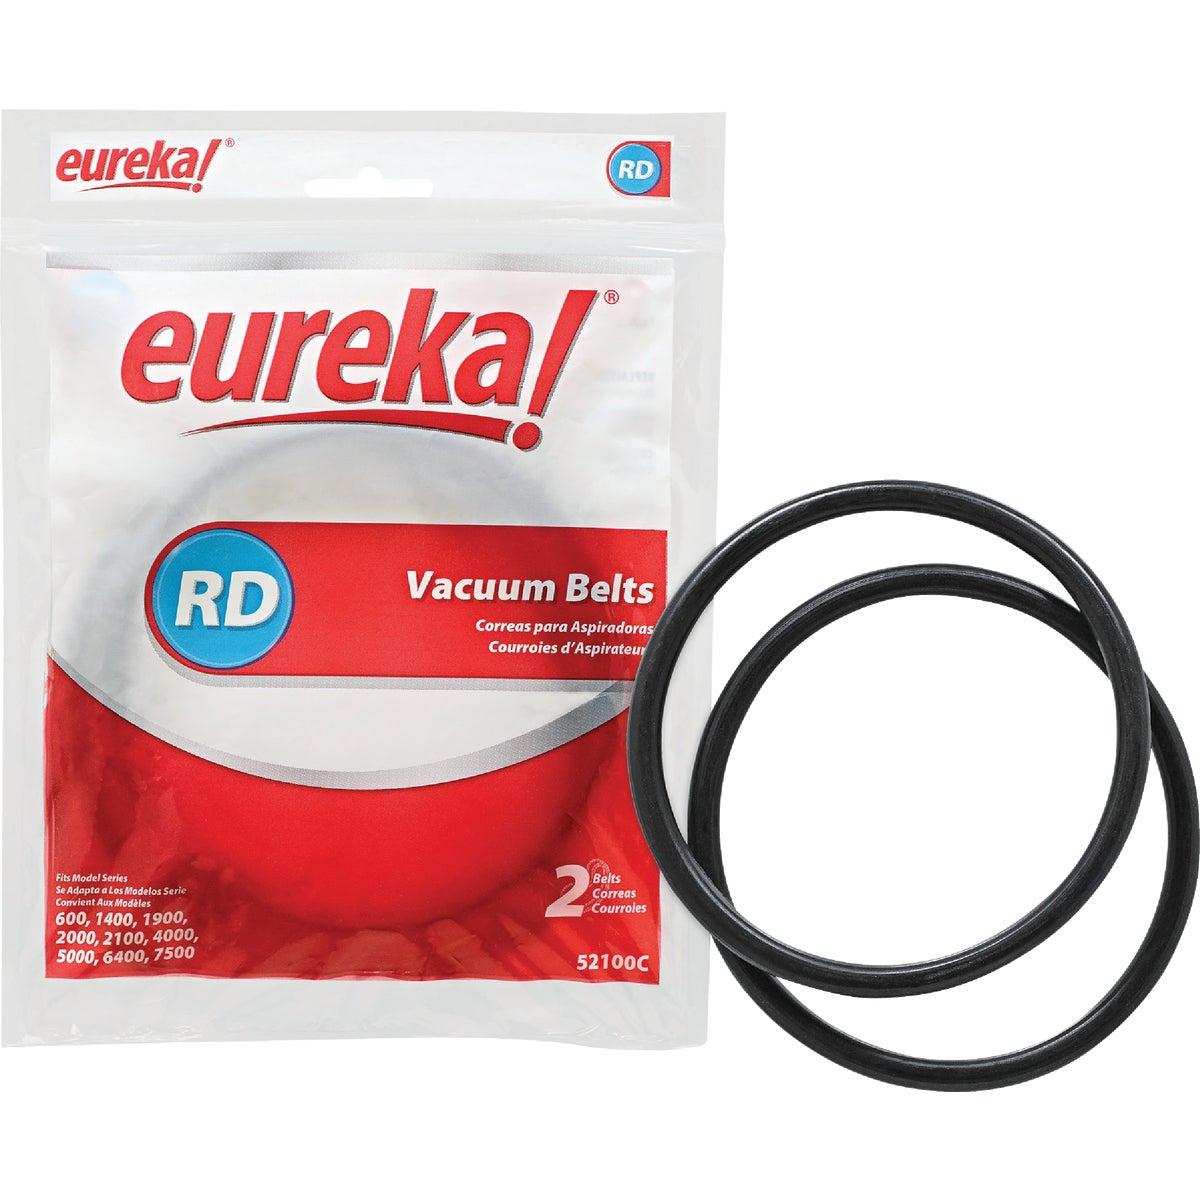 Eureka Style Rd Vac Belt